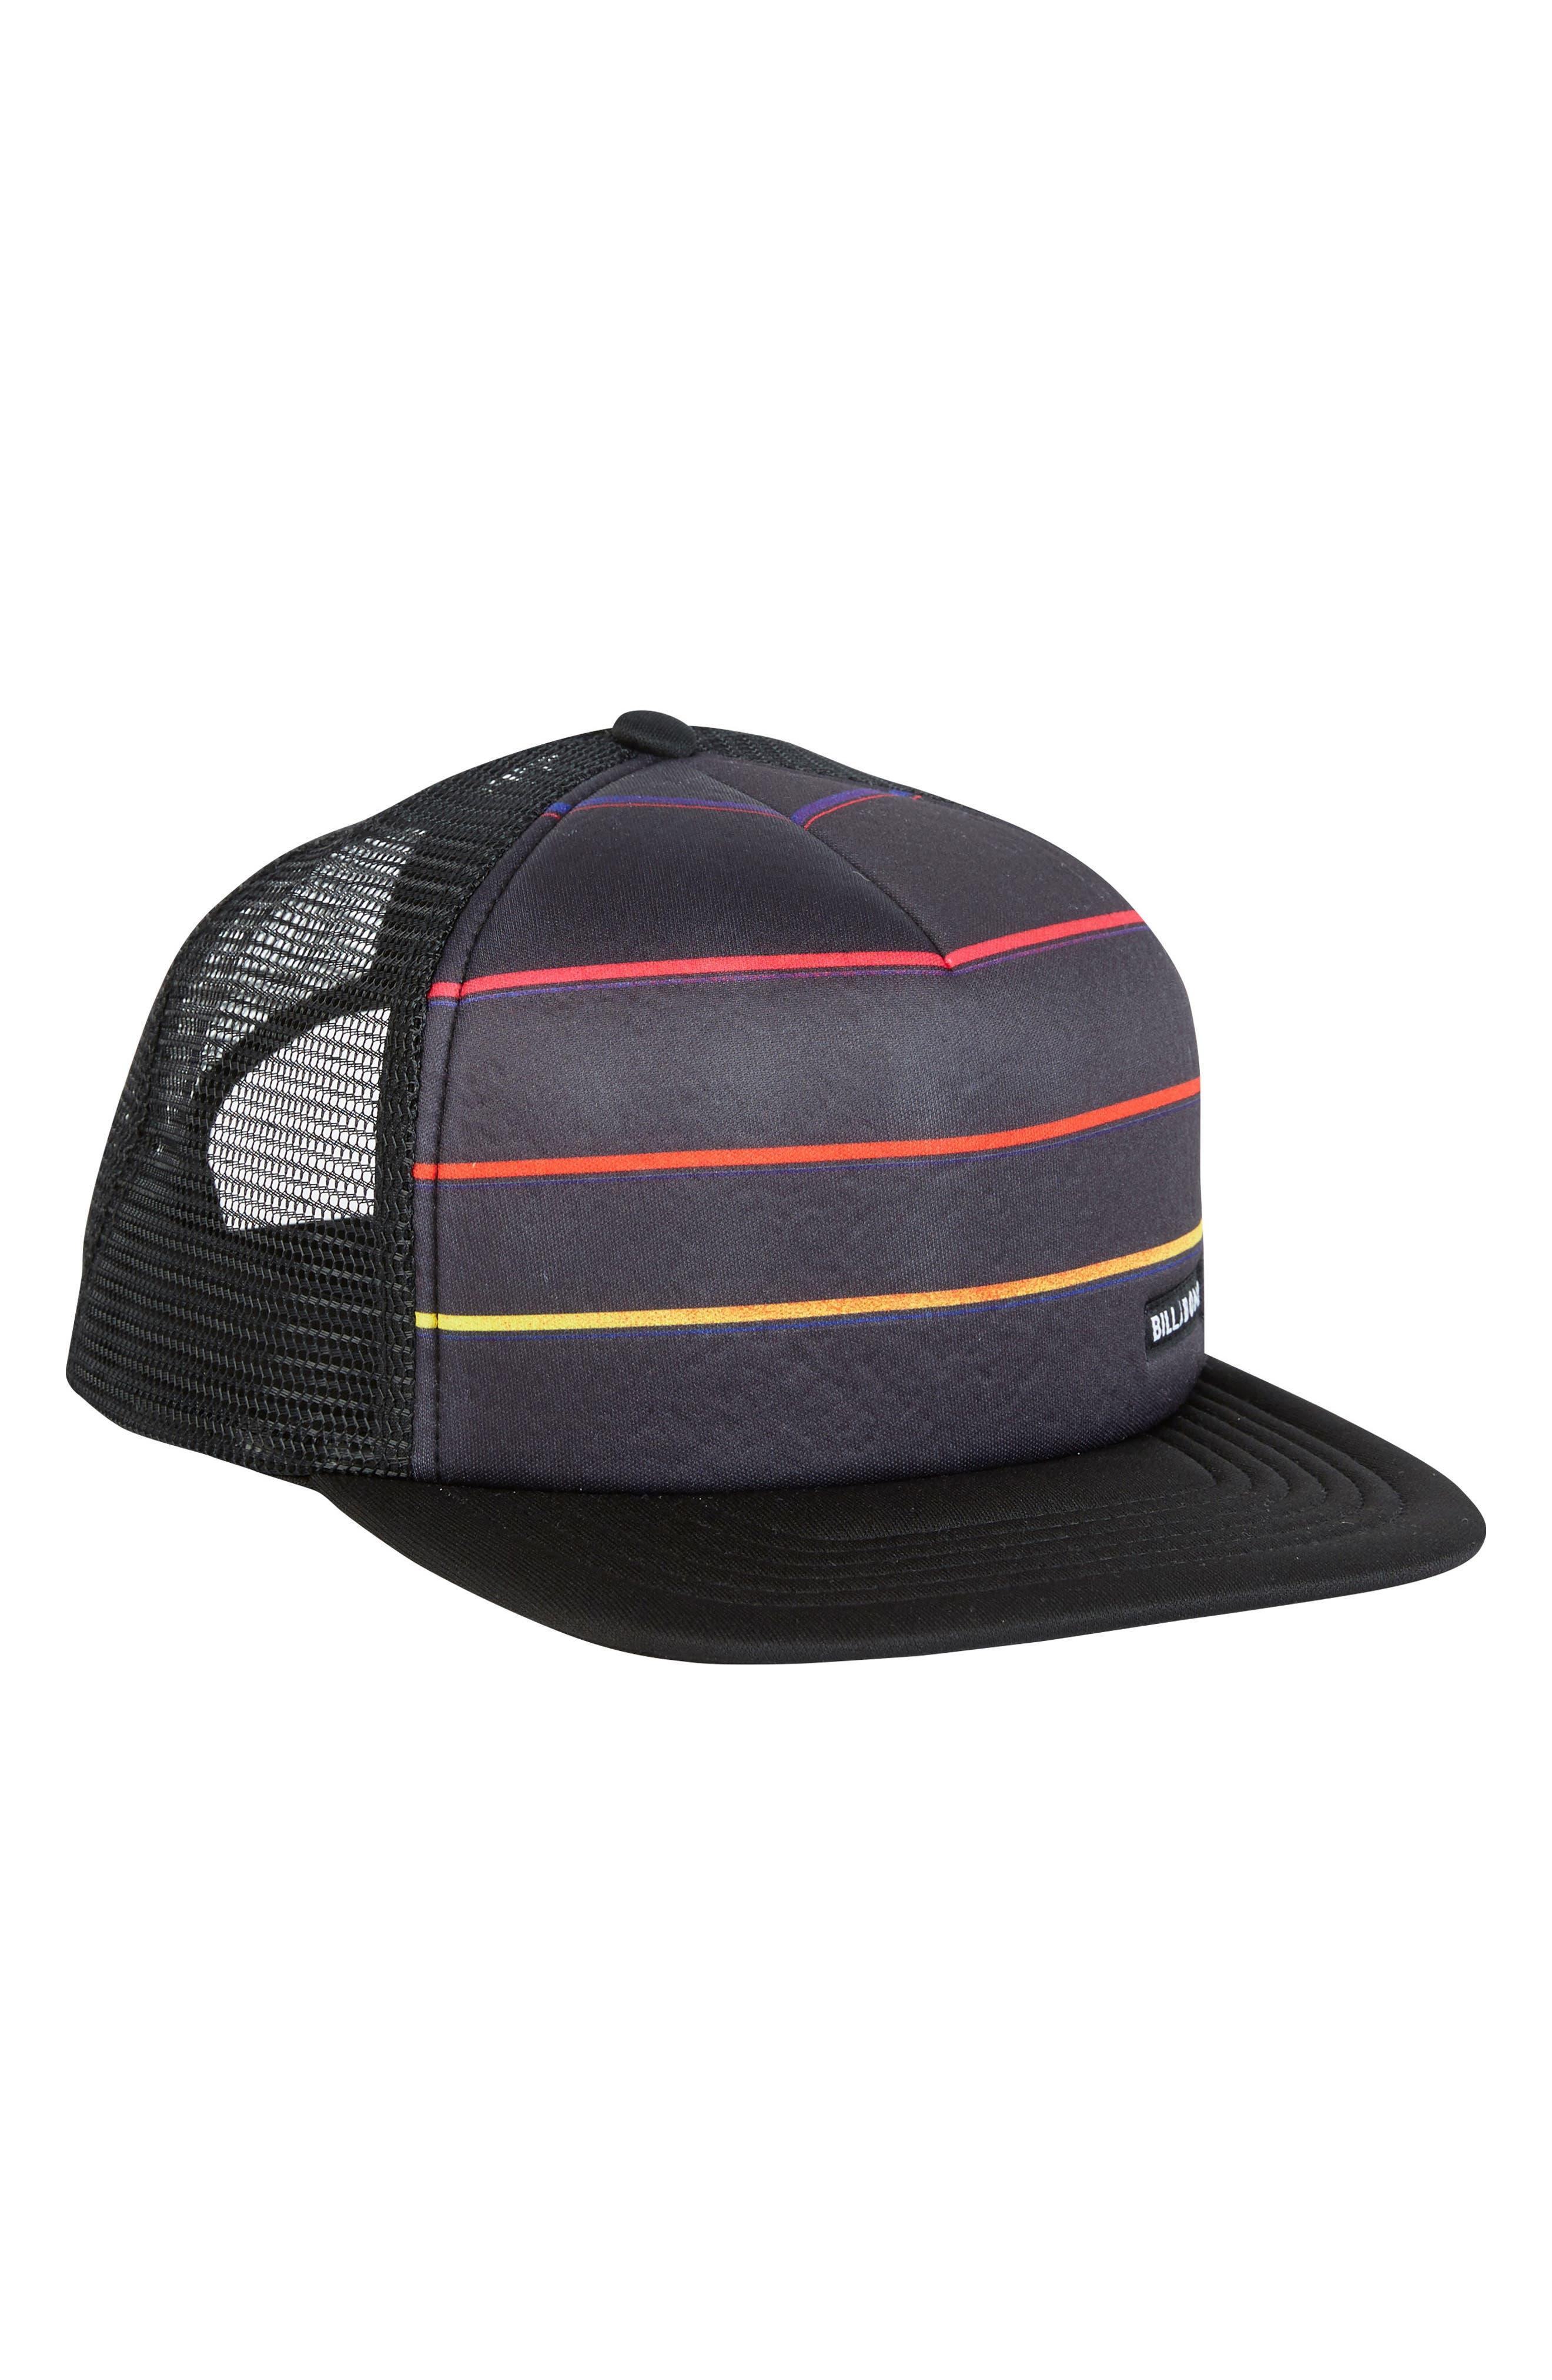 73 Snapback Trucker Hat,                             Main thumbnail 1, color,                             001